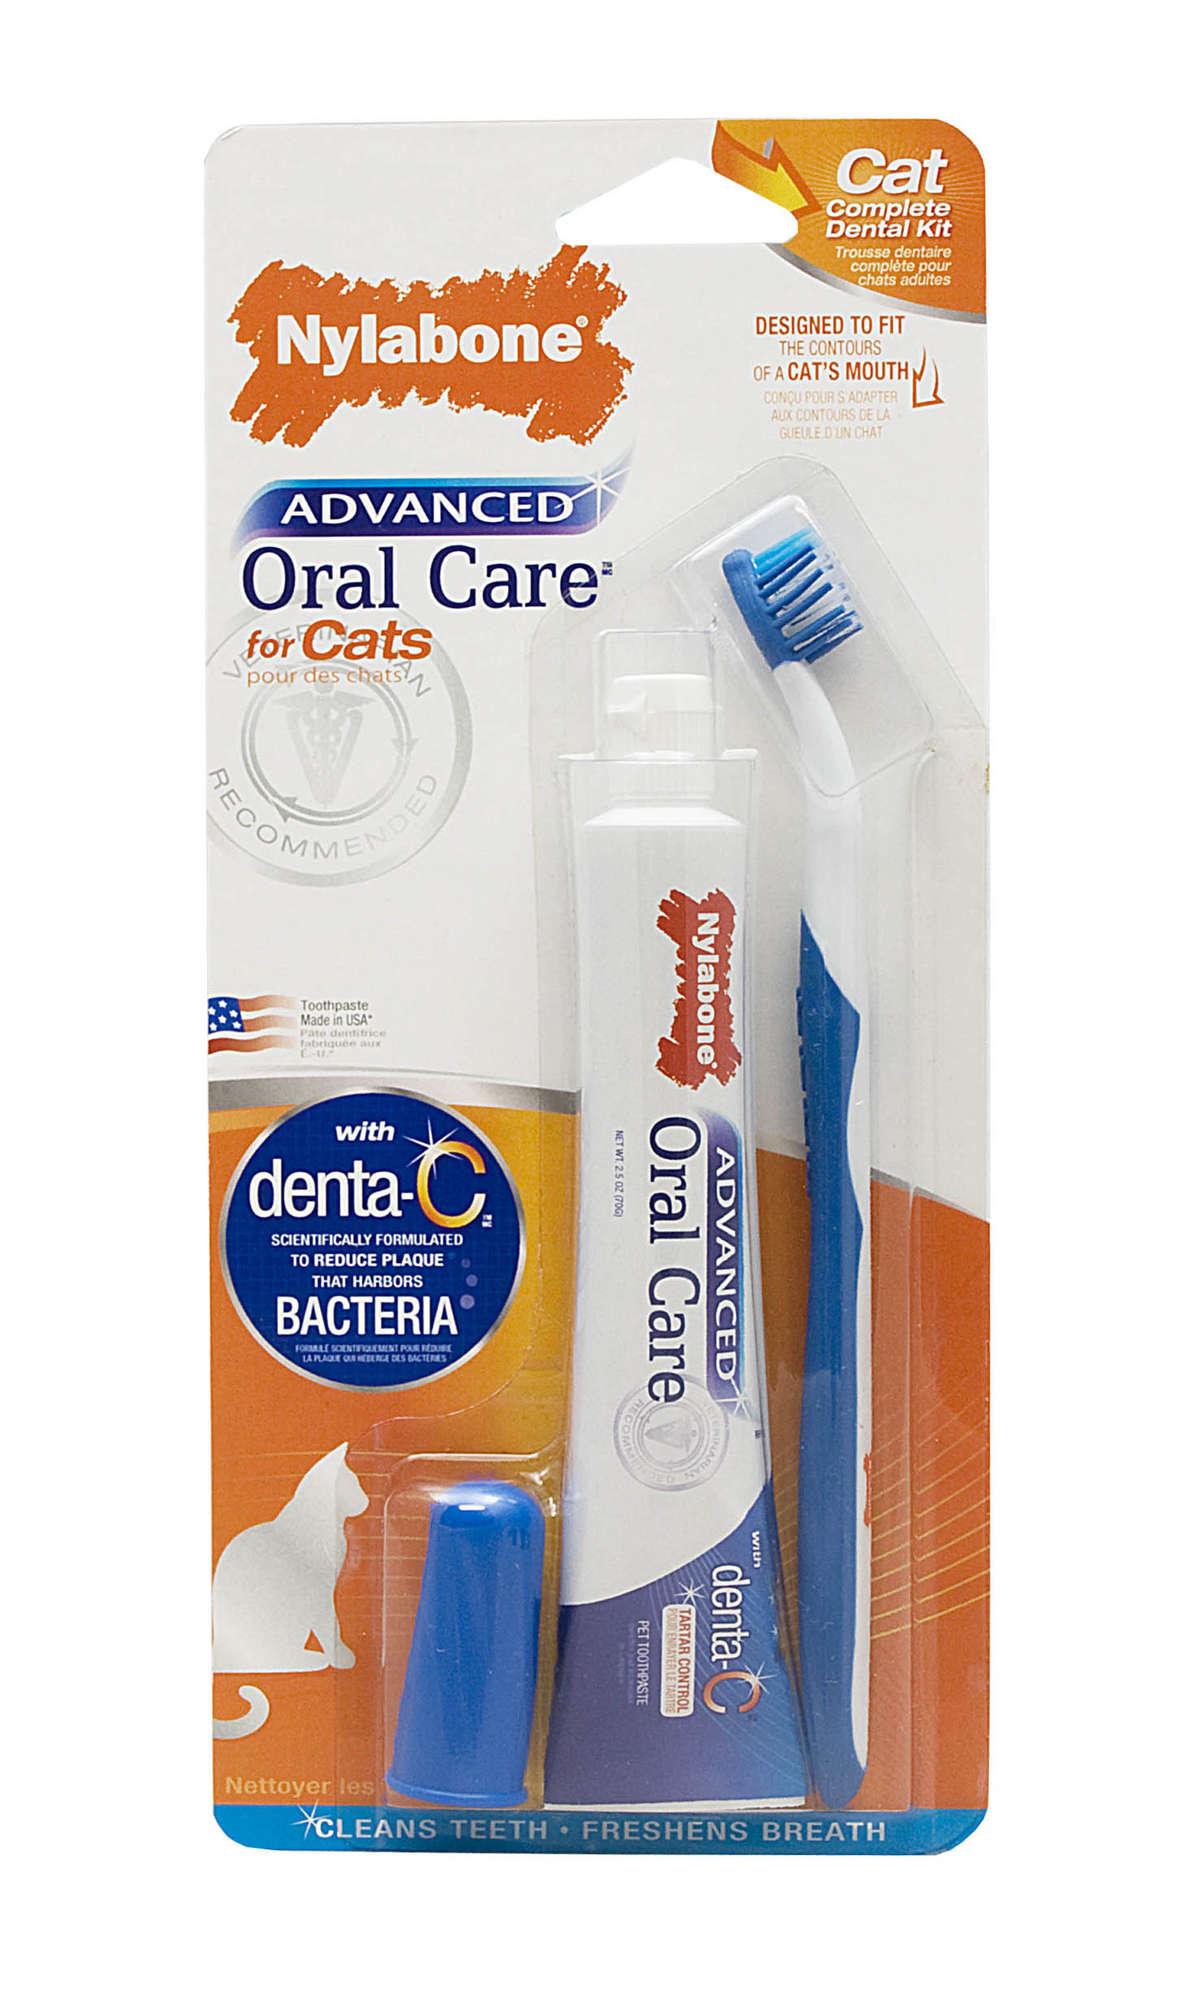 Advanced Oral Care Cat Dental Kit